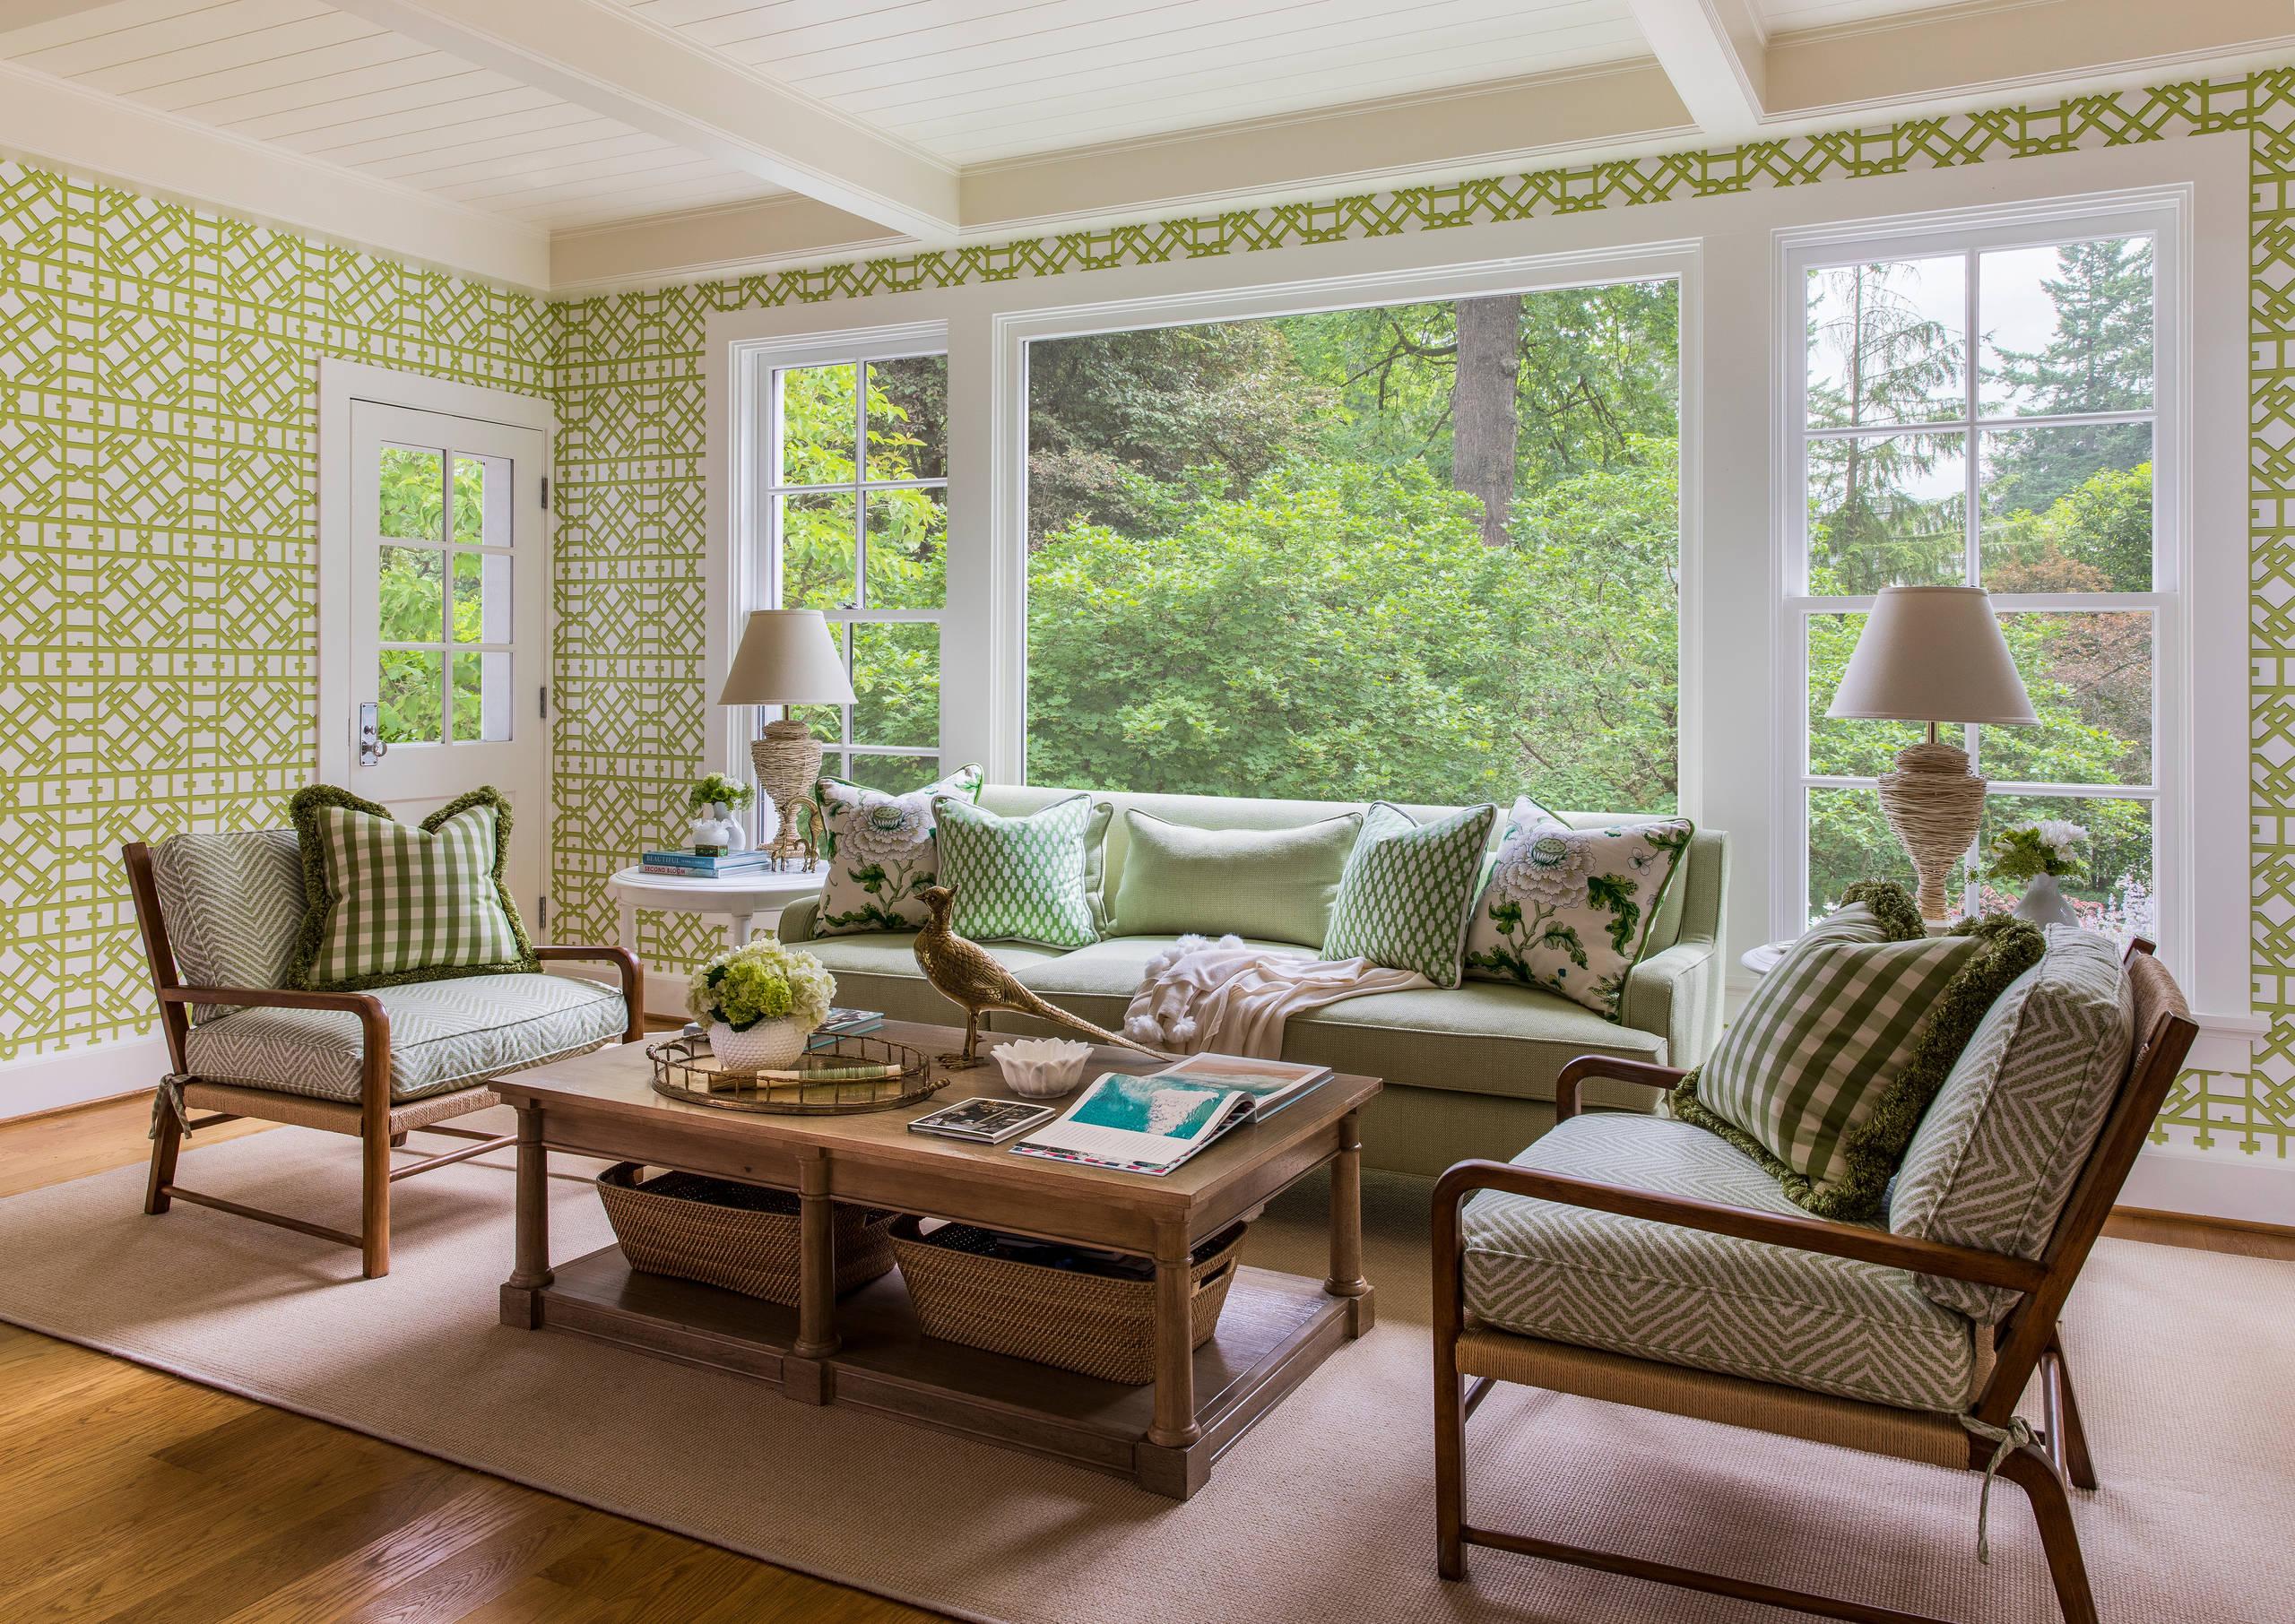 26 Beautiful Green Light Wood Floor Sunroom Pictures & Ideas